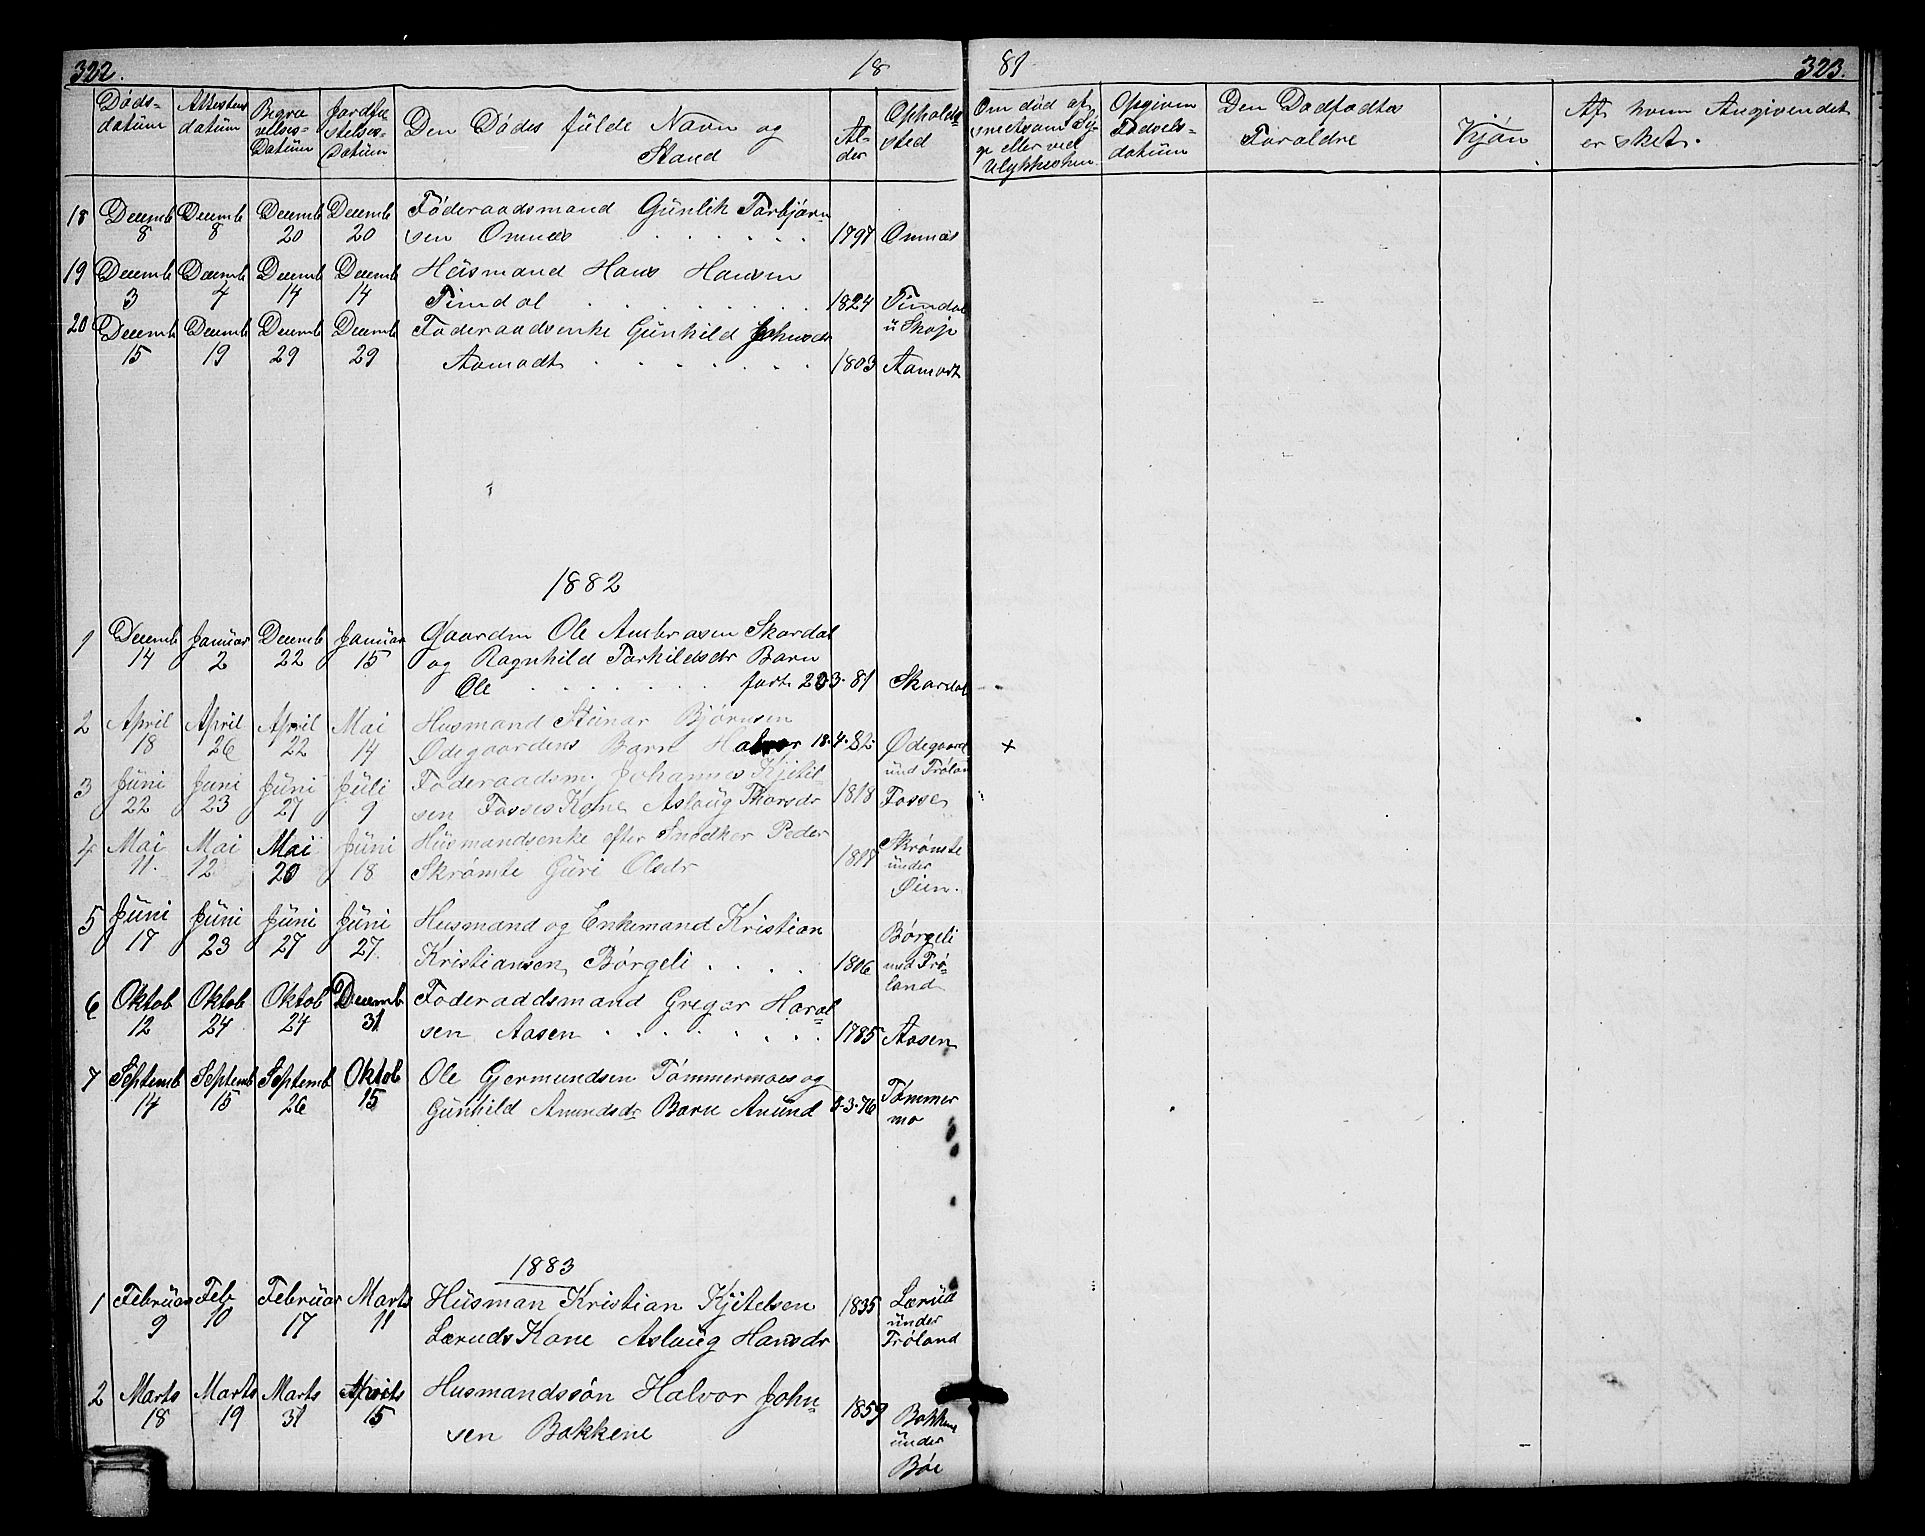 SAKO, Hjartdal kirkebøker, G/Gb/L0002: Klokkerbok nr. II 2, 1854-1884, s. 322-323